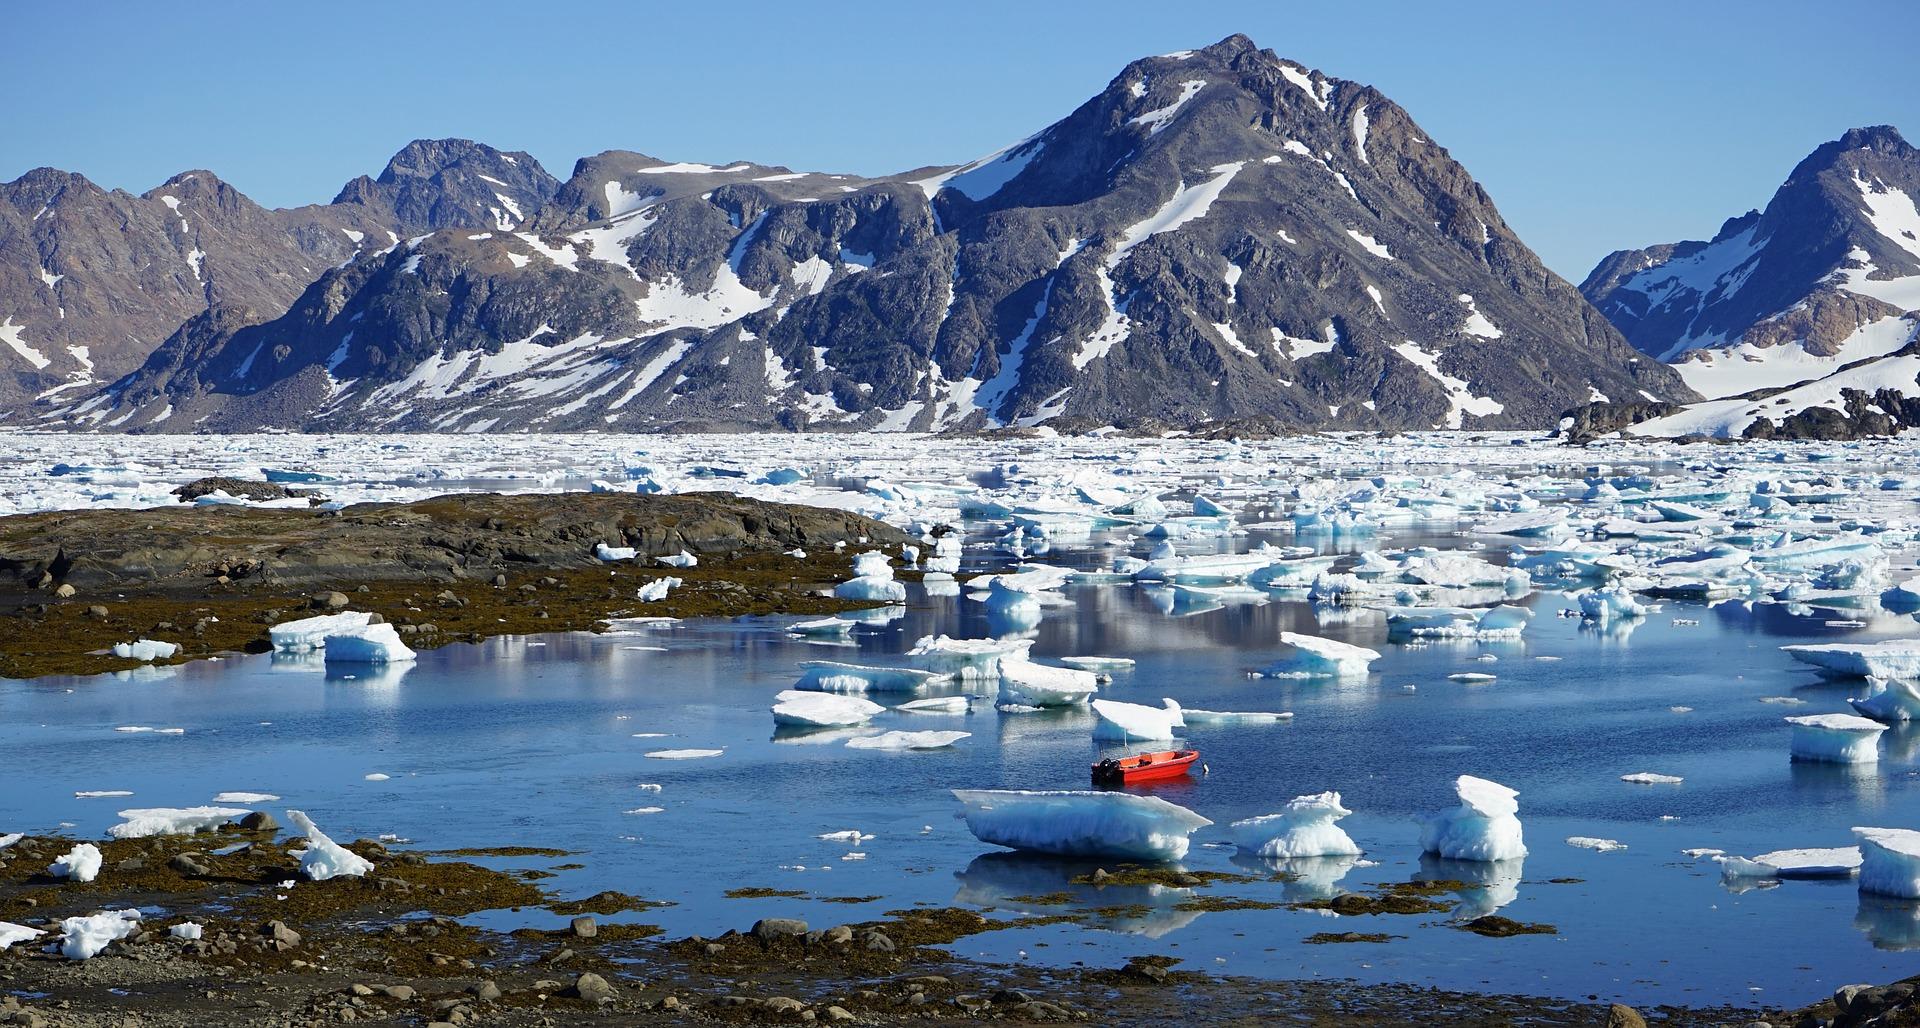 5. Greenland